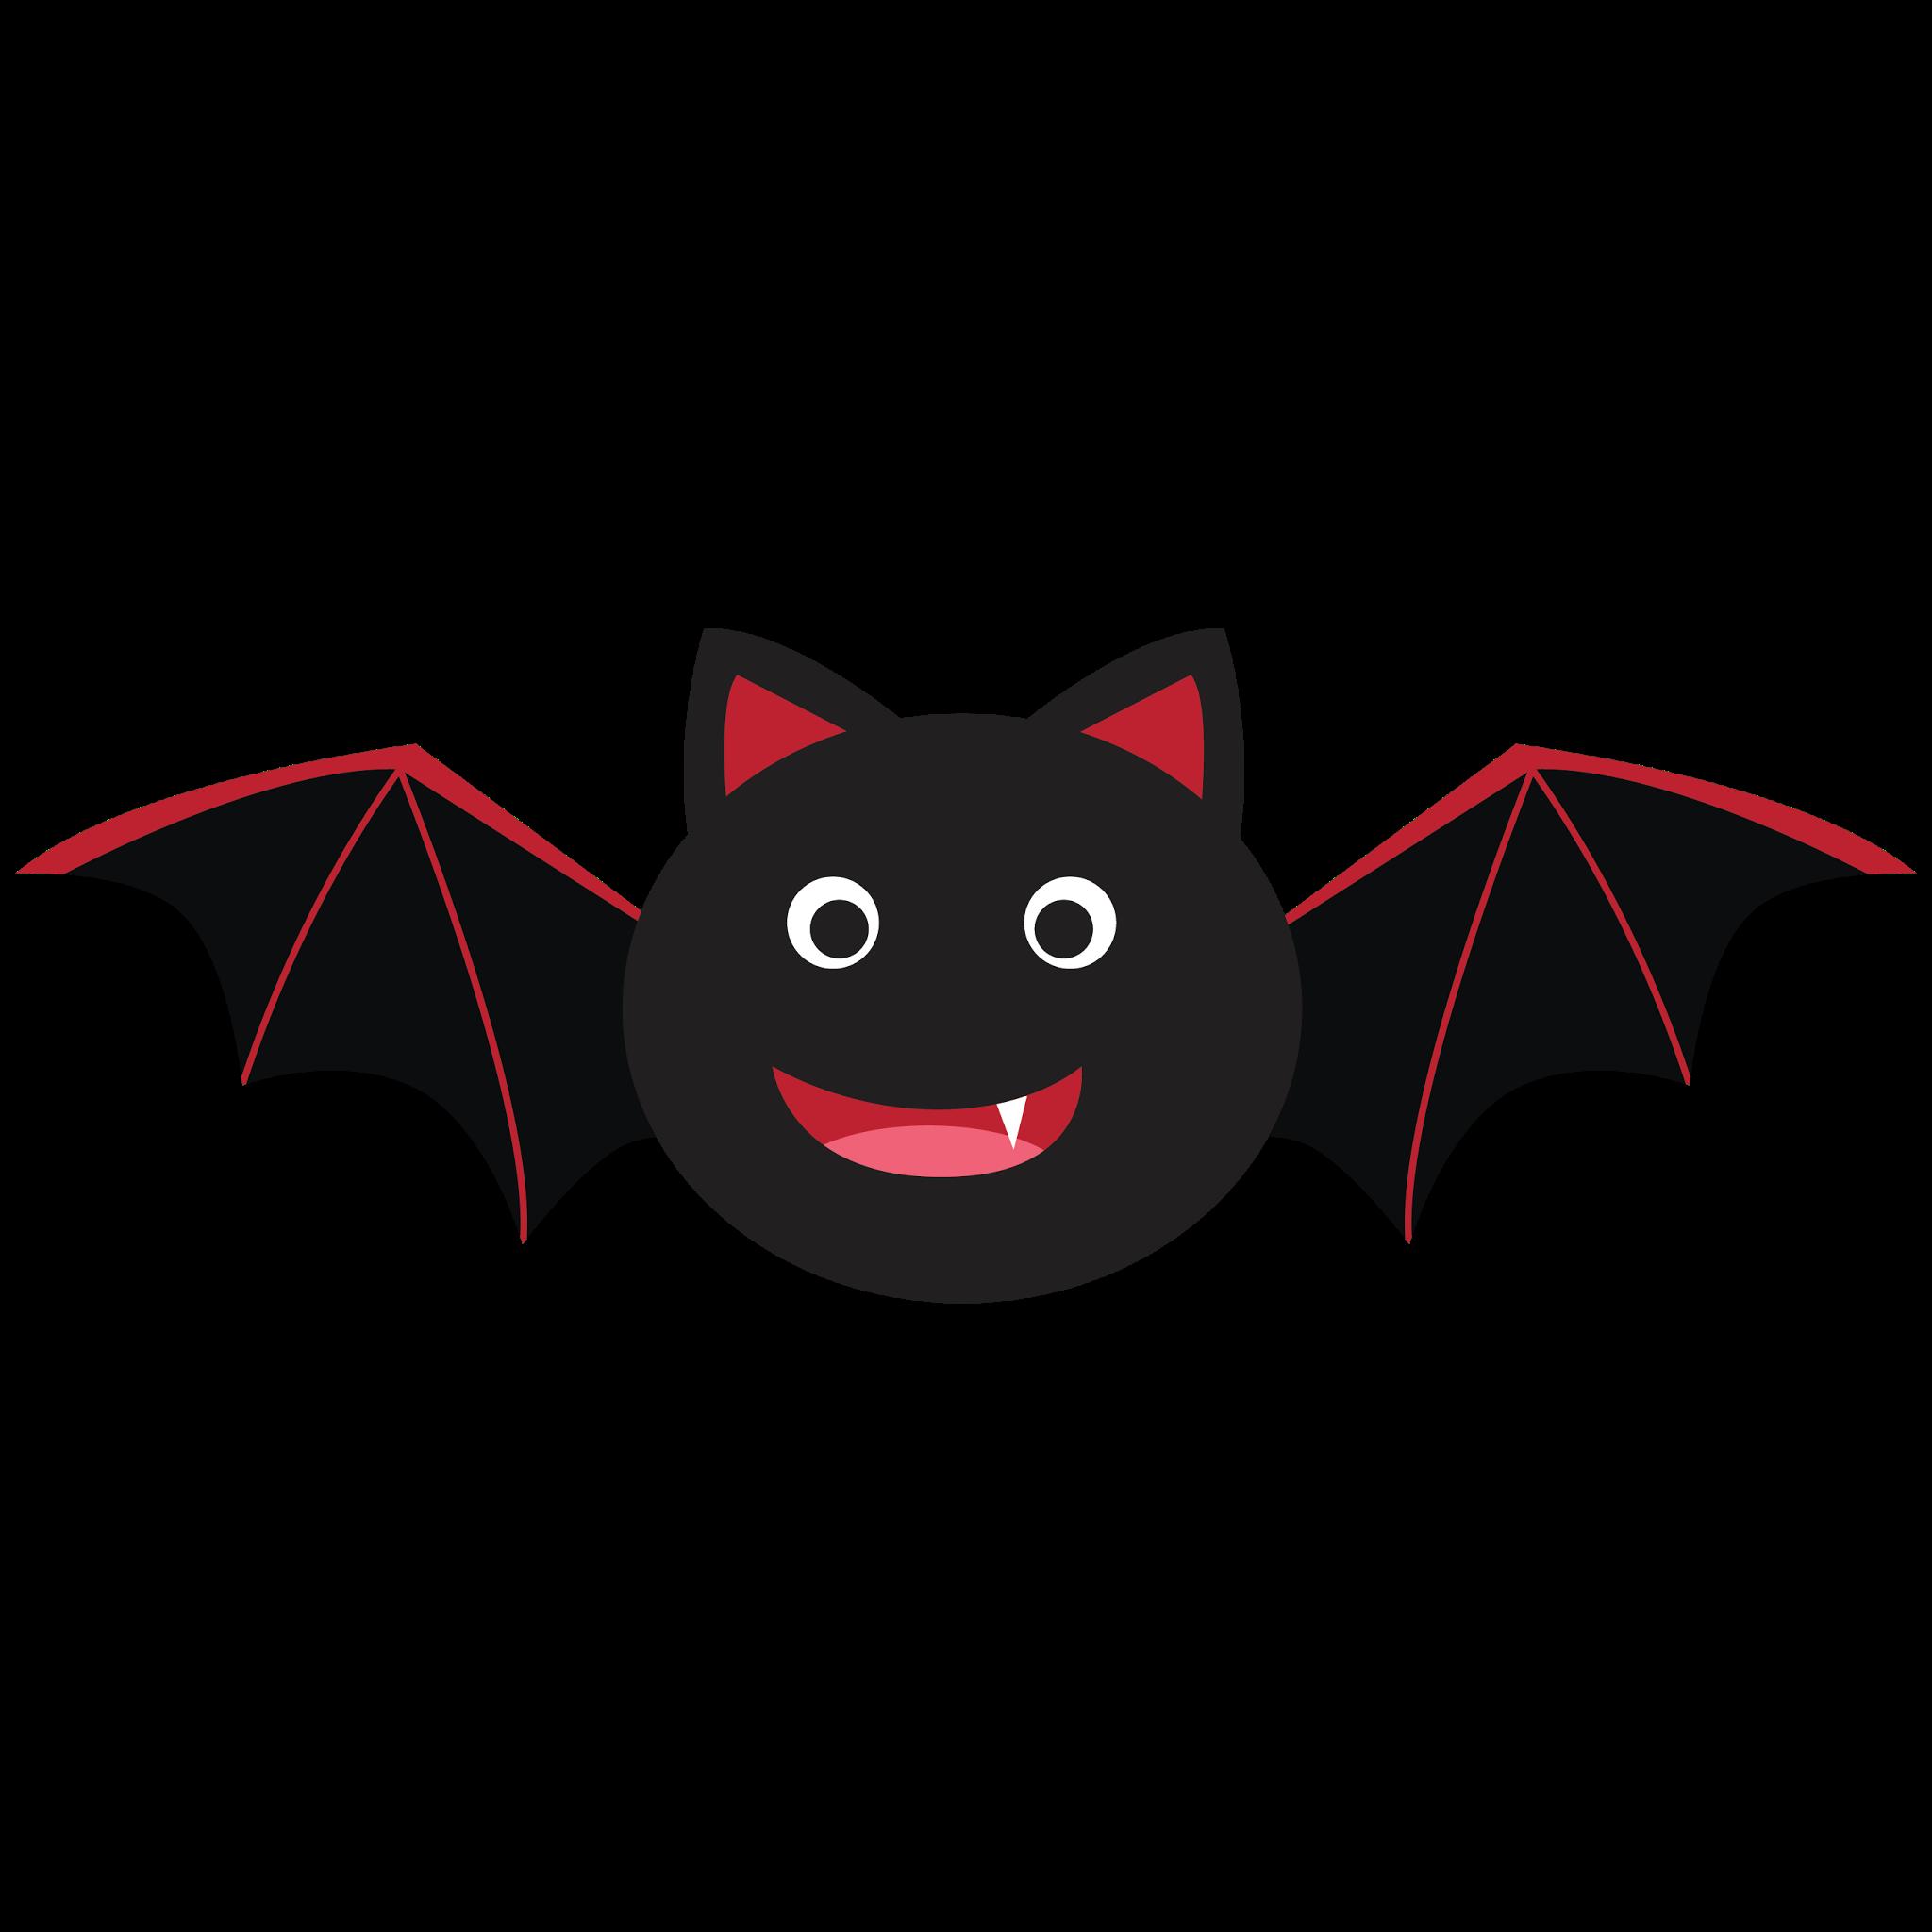 Cute Bat Clipart #1